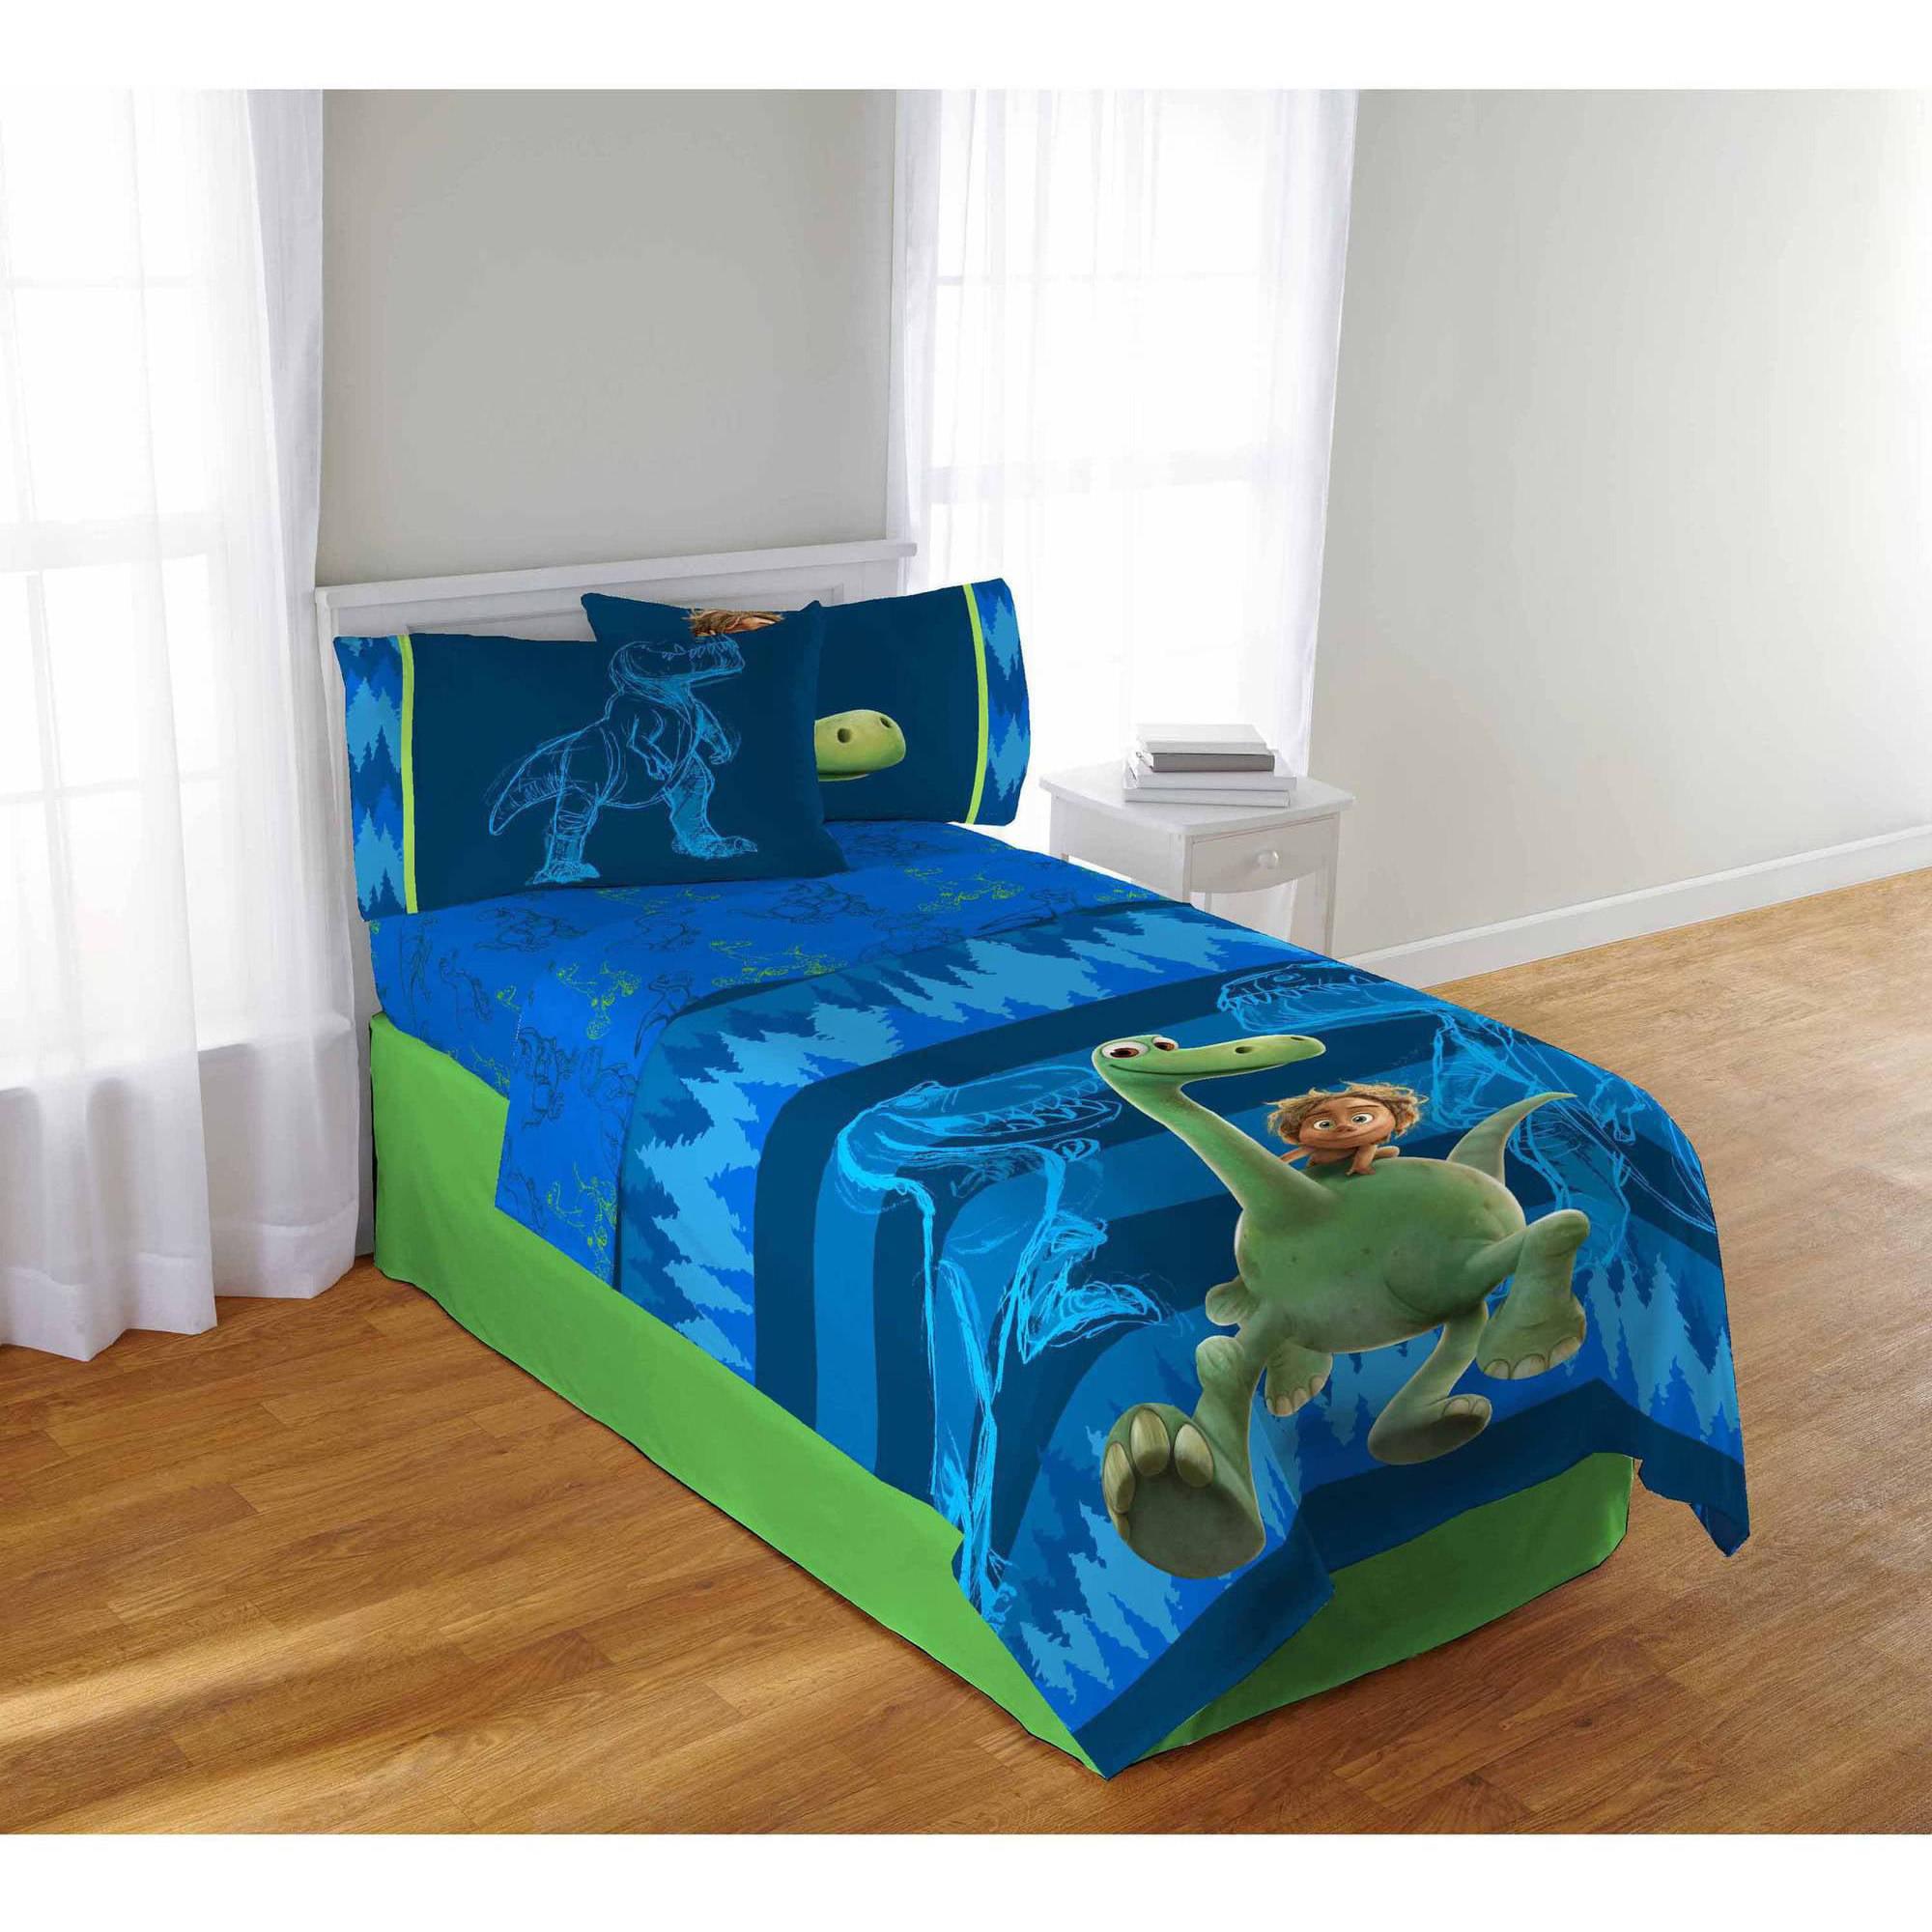 good dinosaur bed sheets bedding queen